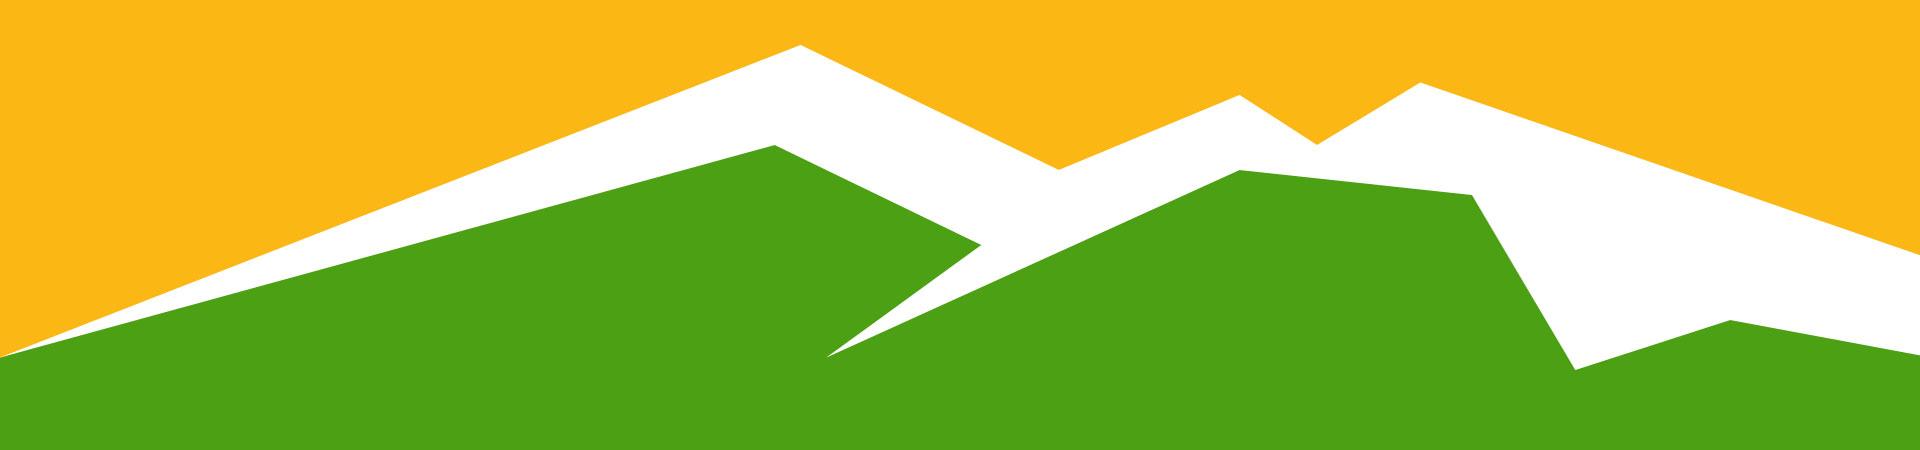 montagne jaune vert